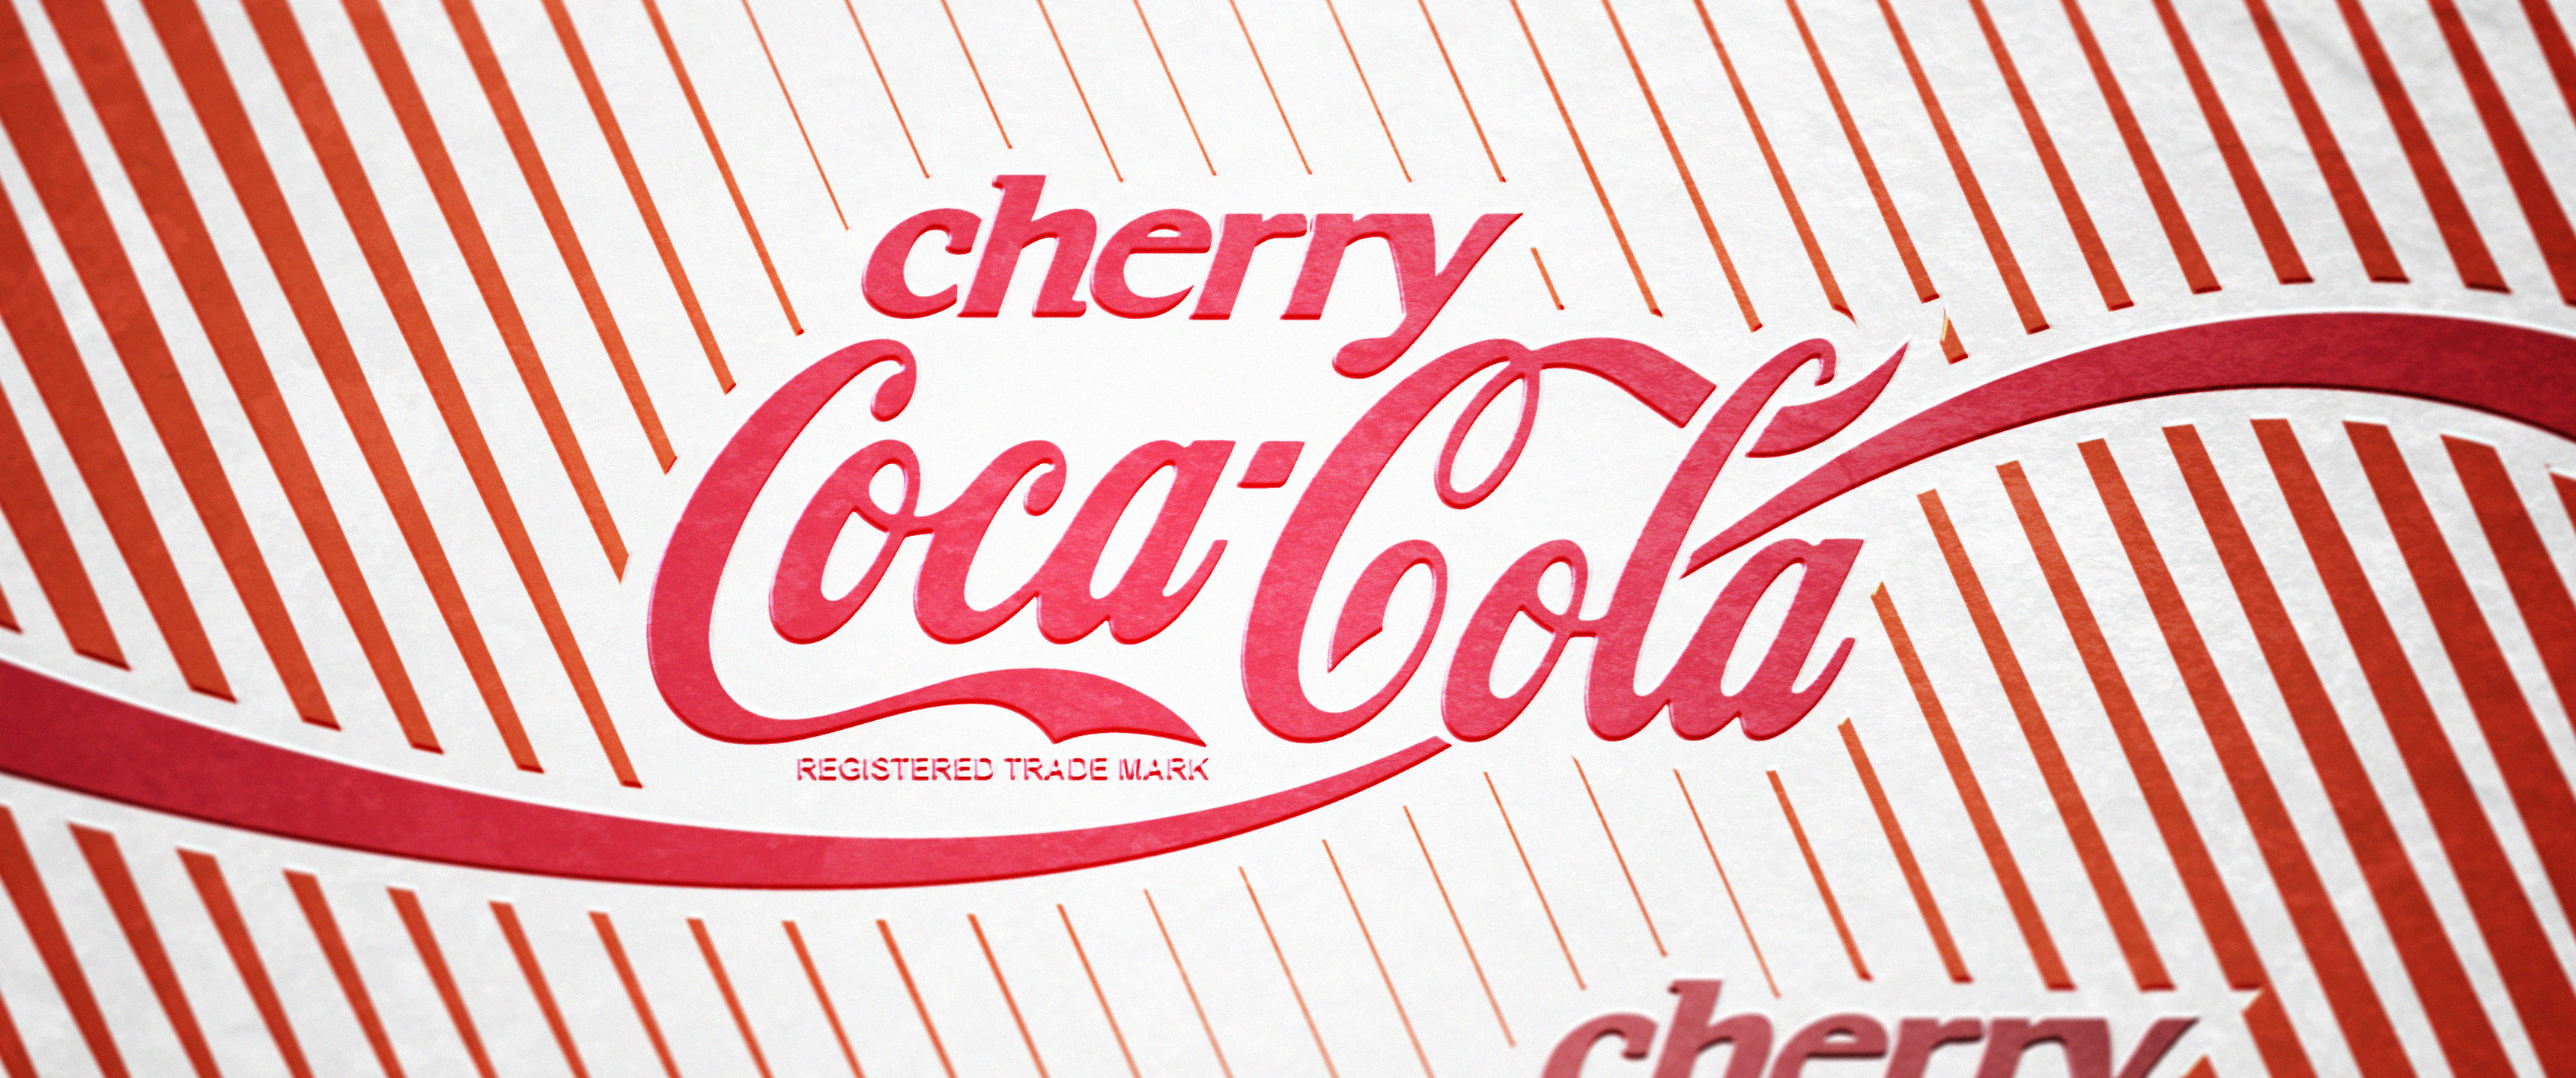 CherryCoke_Wallpaper_UQHD_1